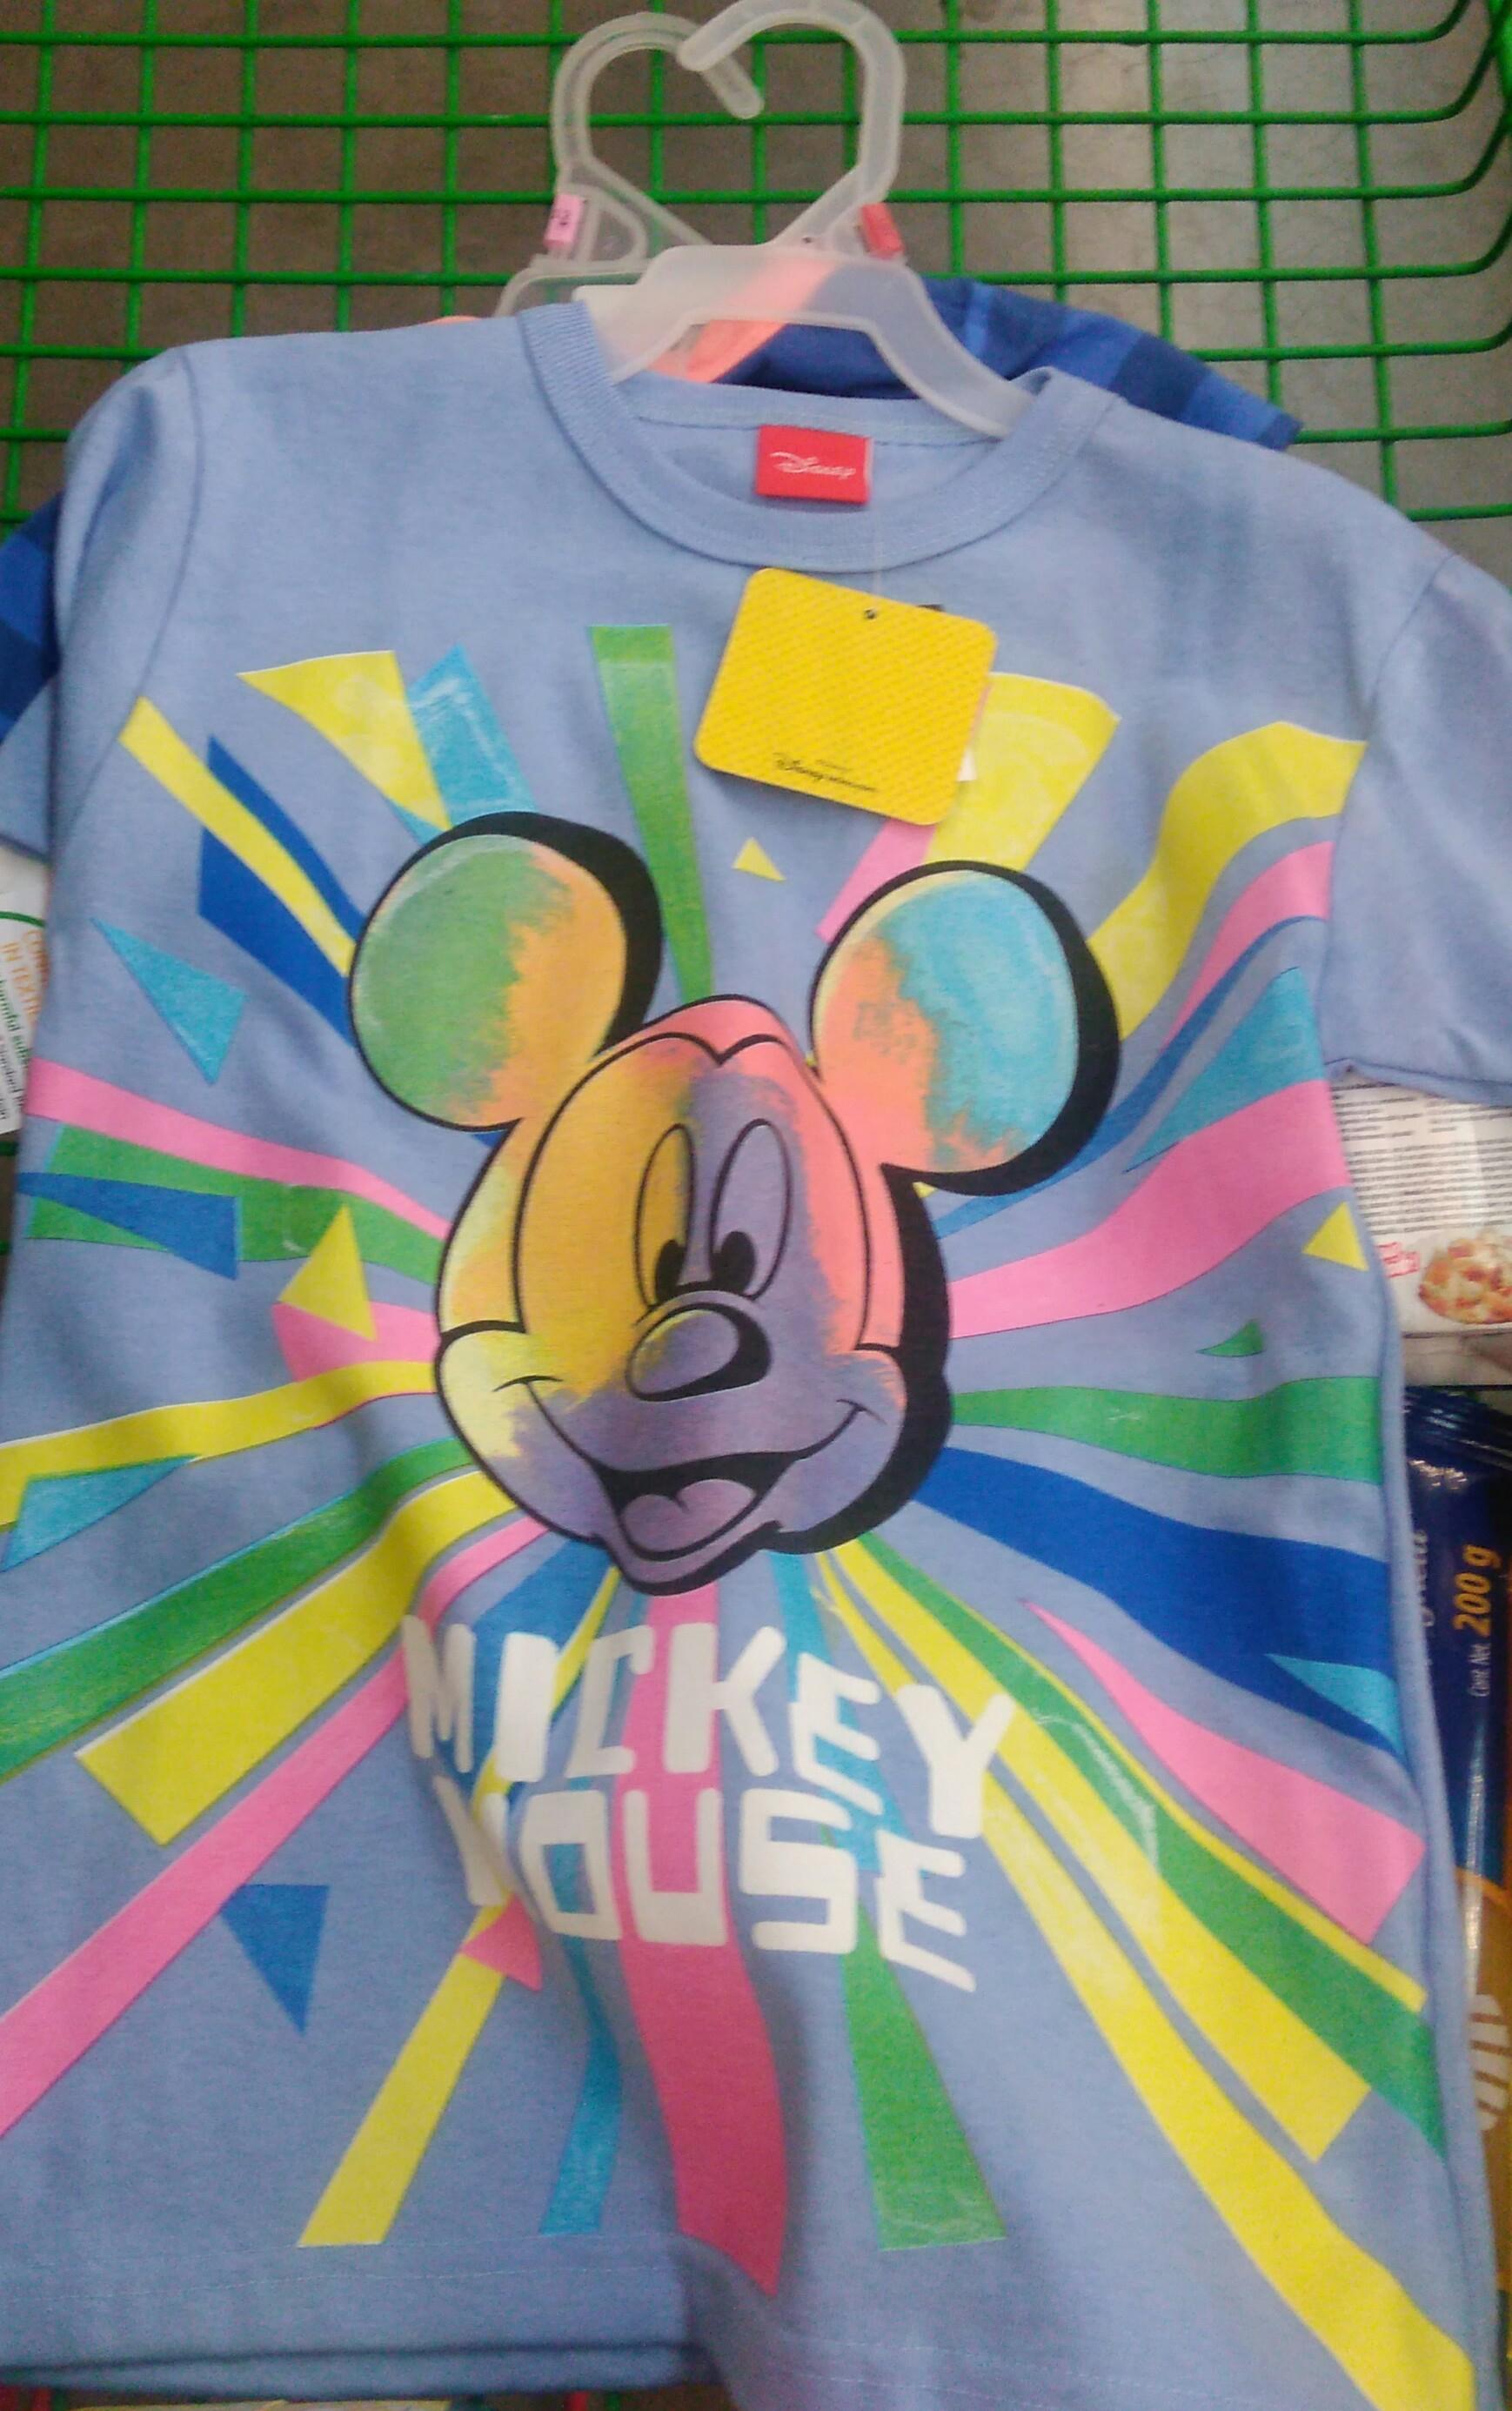 Bodega Aurrerá: Playera Disney de $45 a $10.02